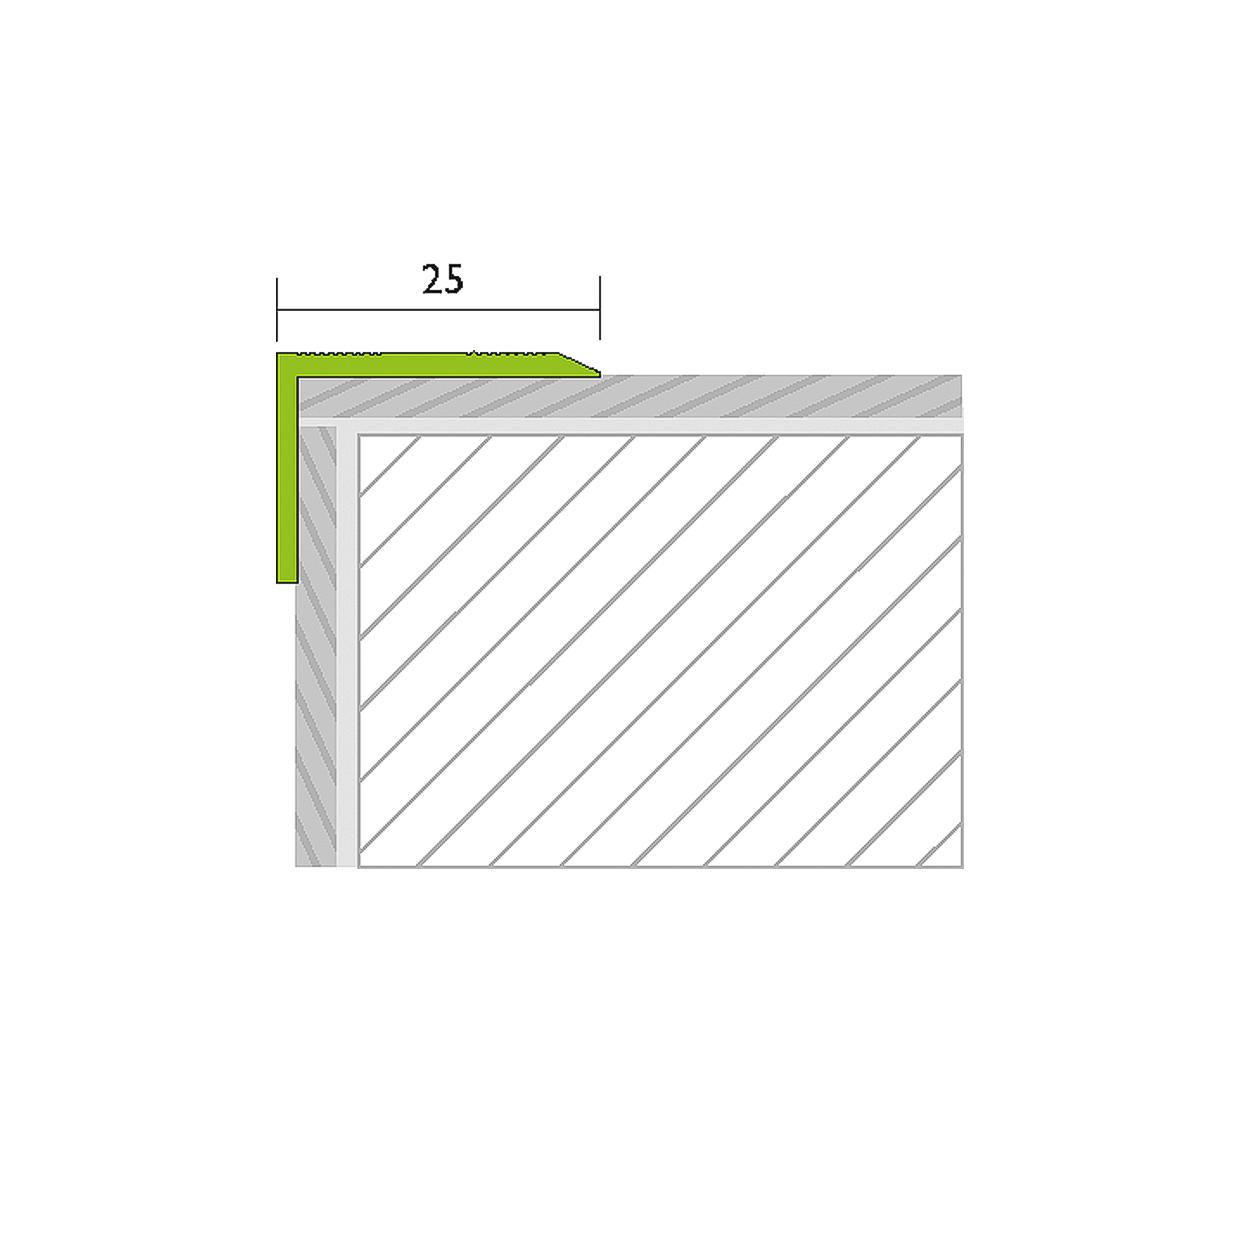 Winkelprofil Alu Edelstahl 24,5x20mm